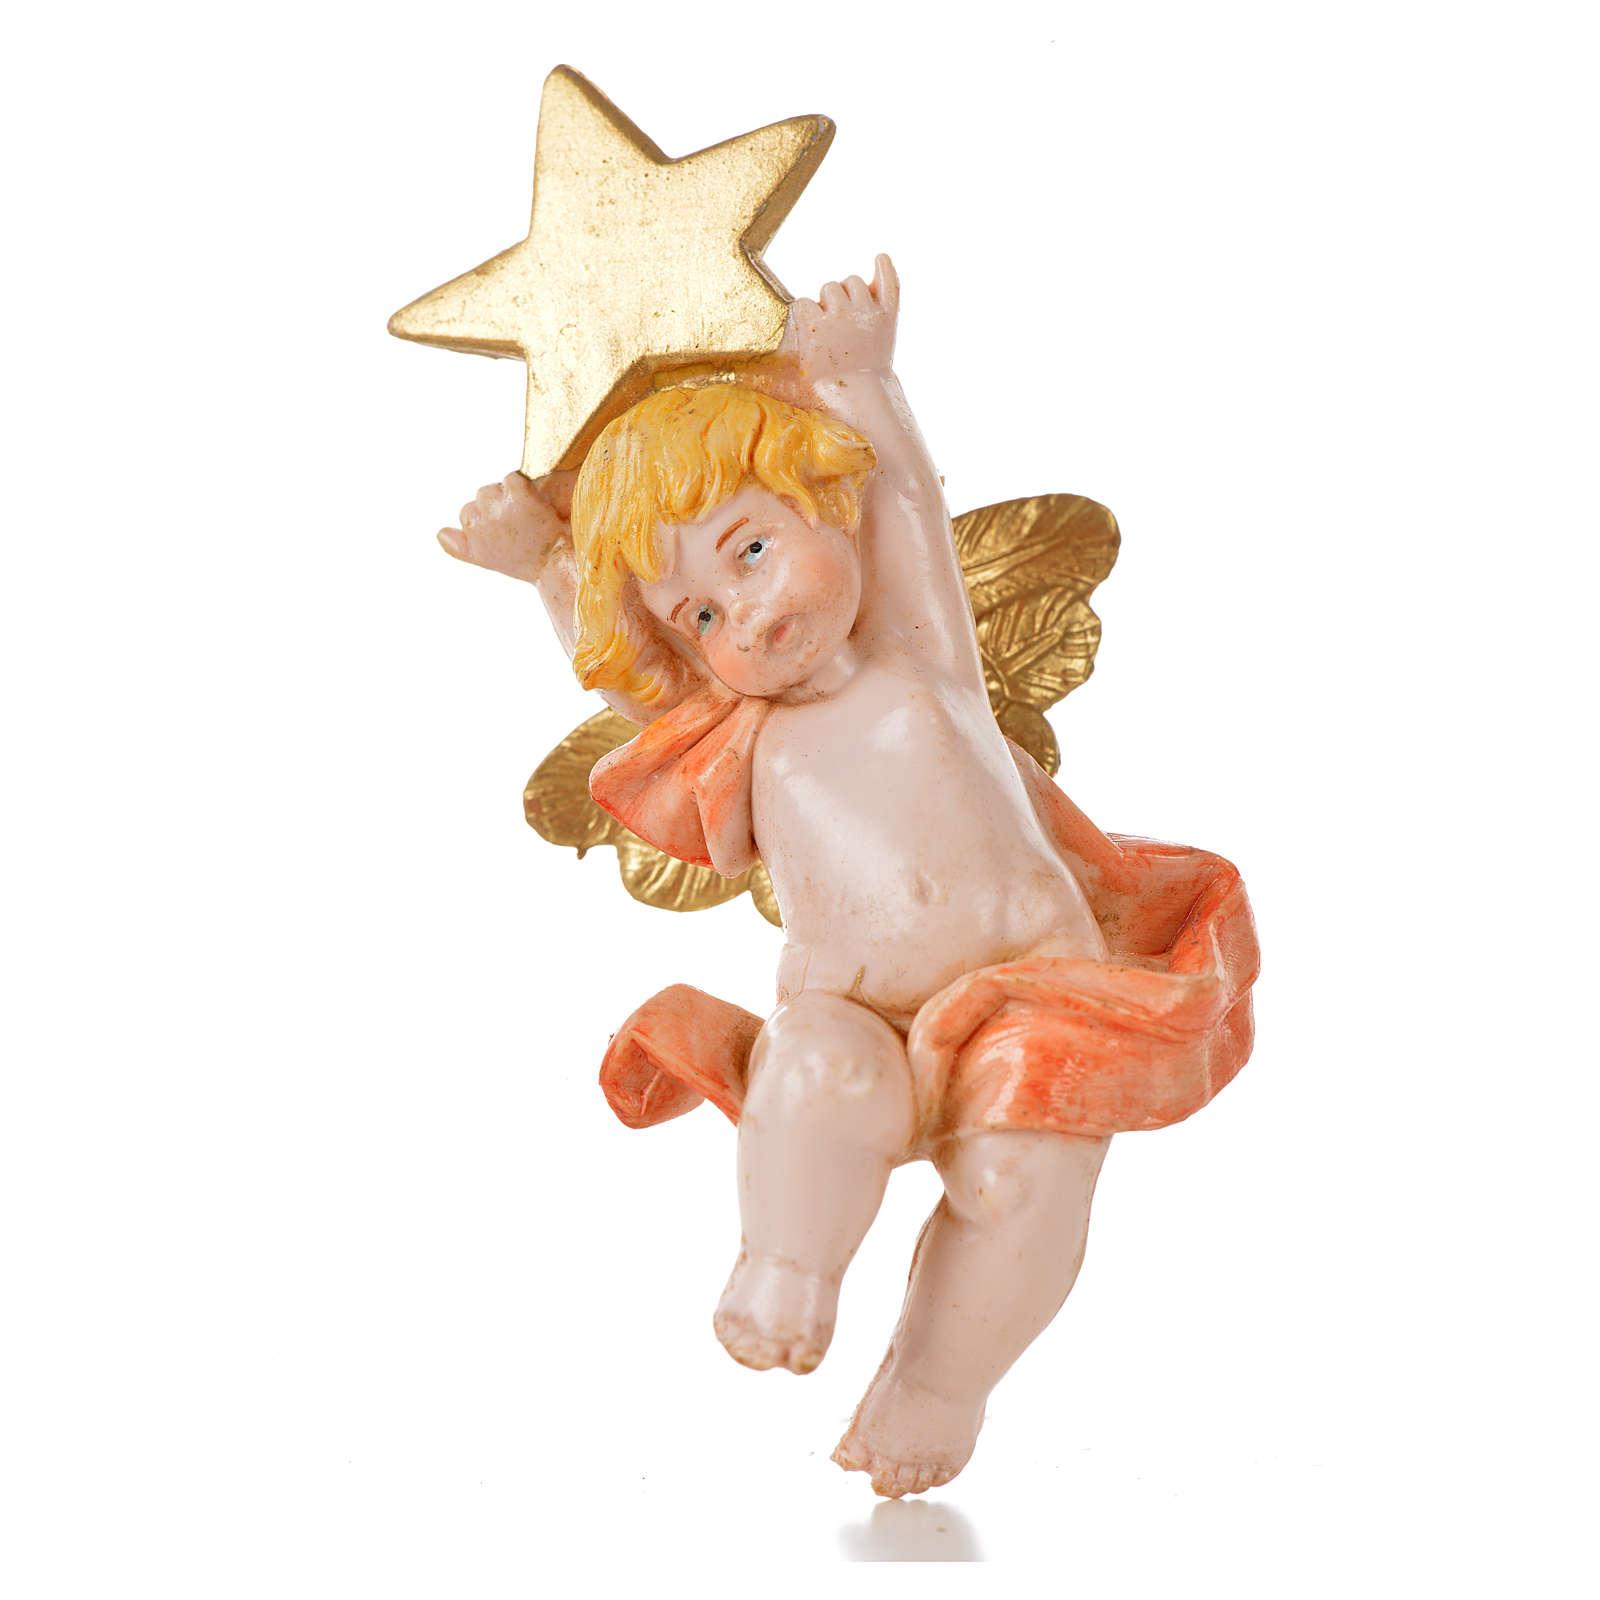 Ángel con estrella rosada Fontanini 7 cm. símil porcelana 3